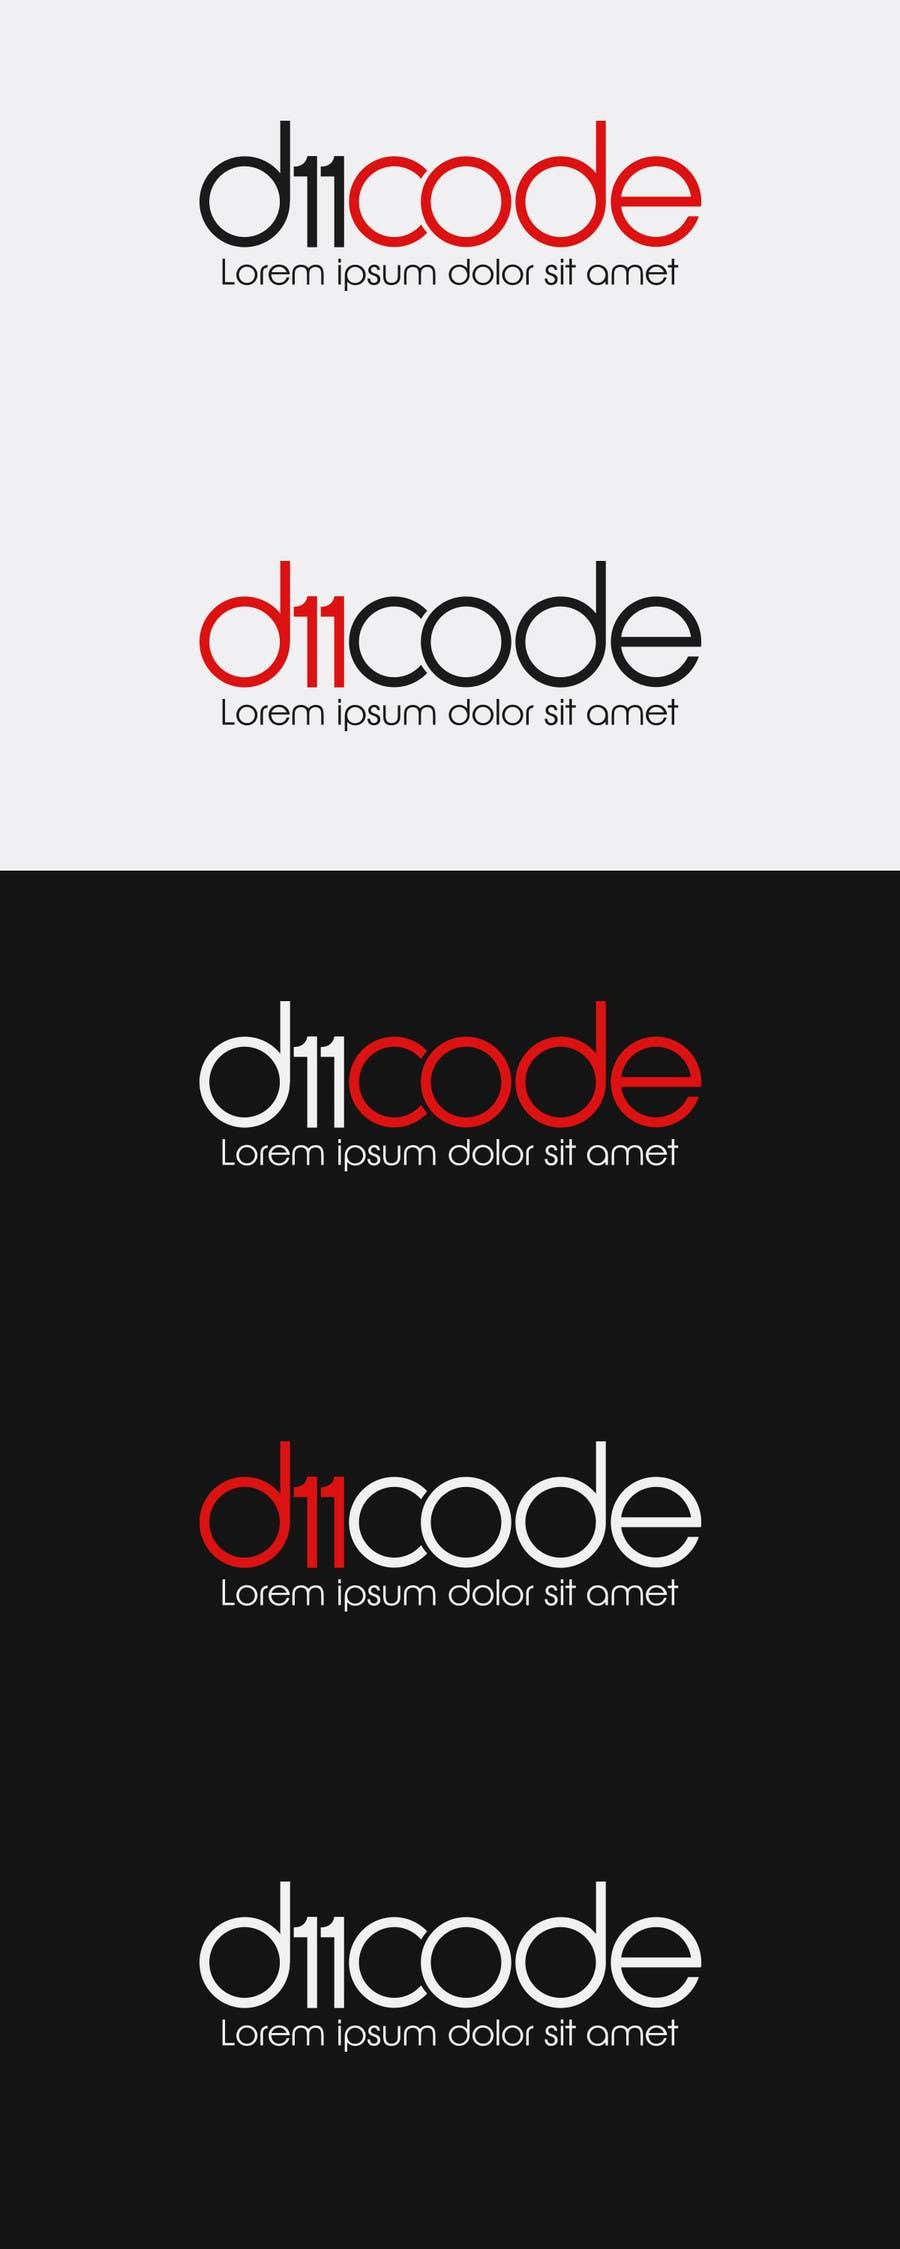 Kilpailutyö #15 kilpailussa Logo and visual identity for a web and software development studio